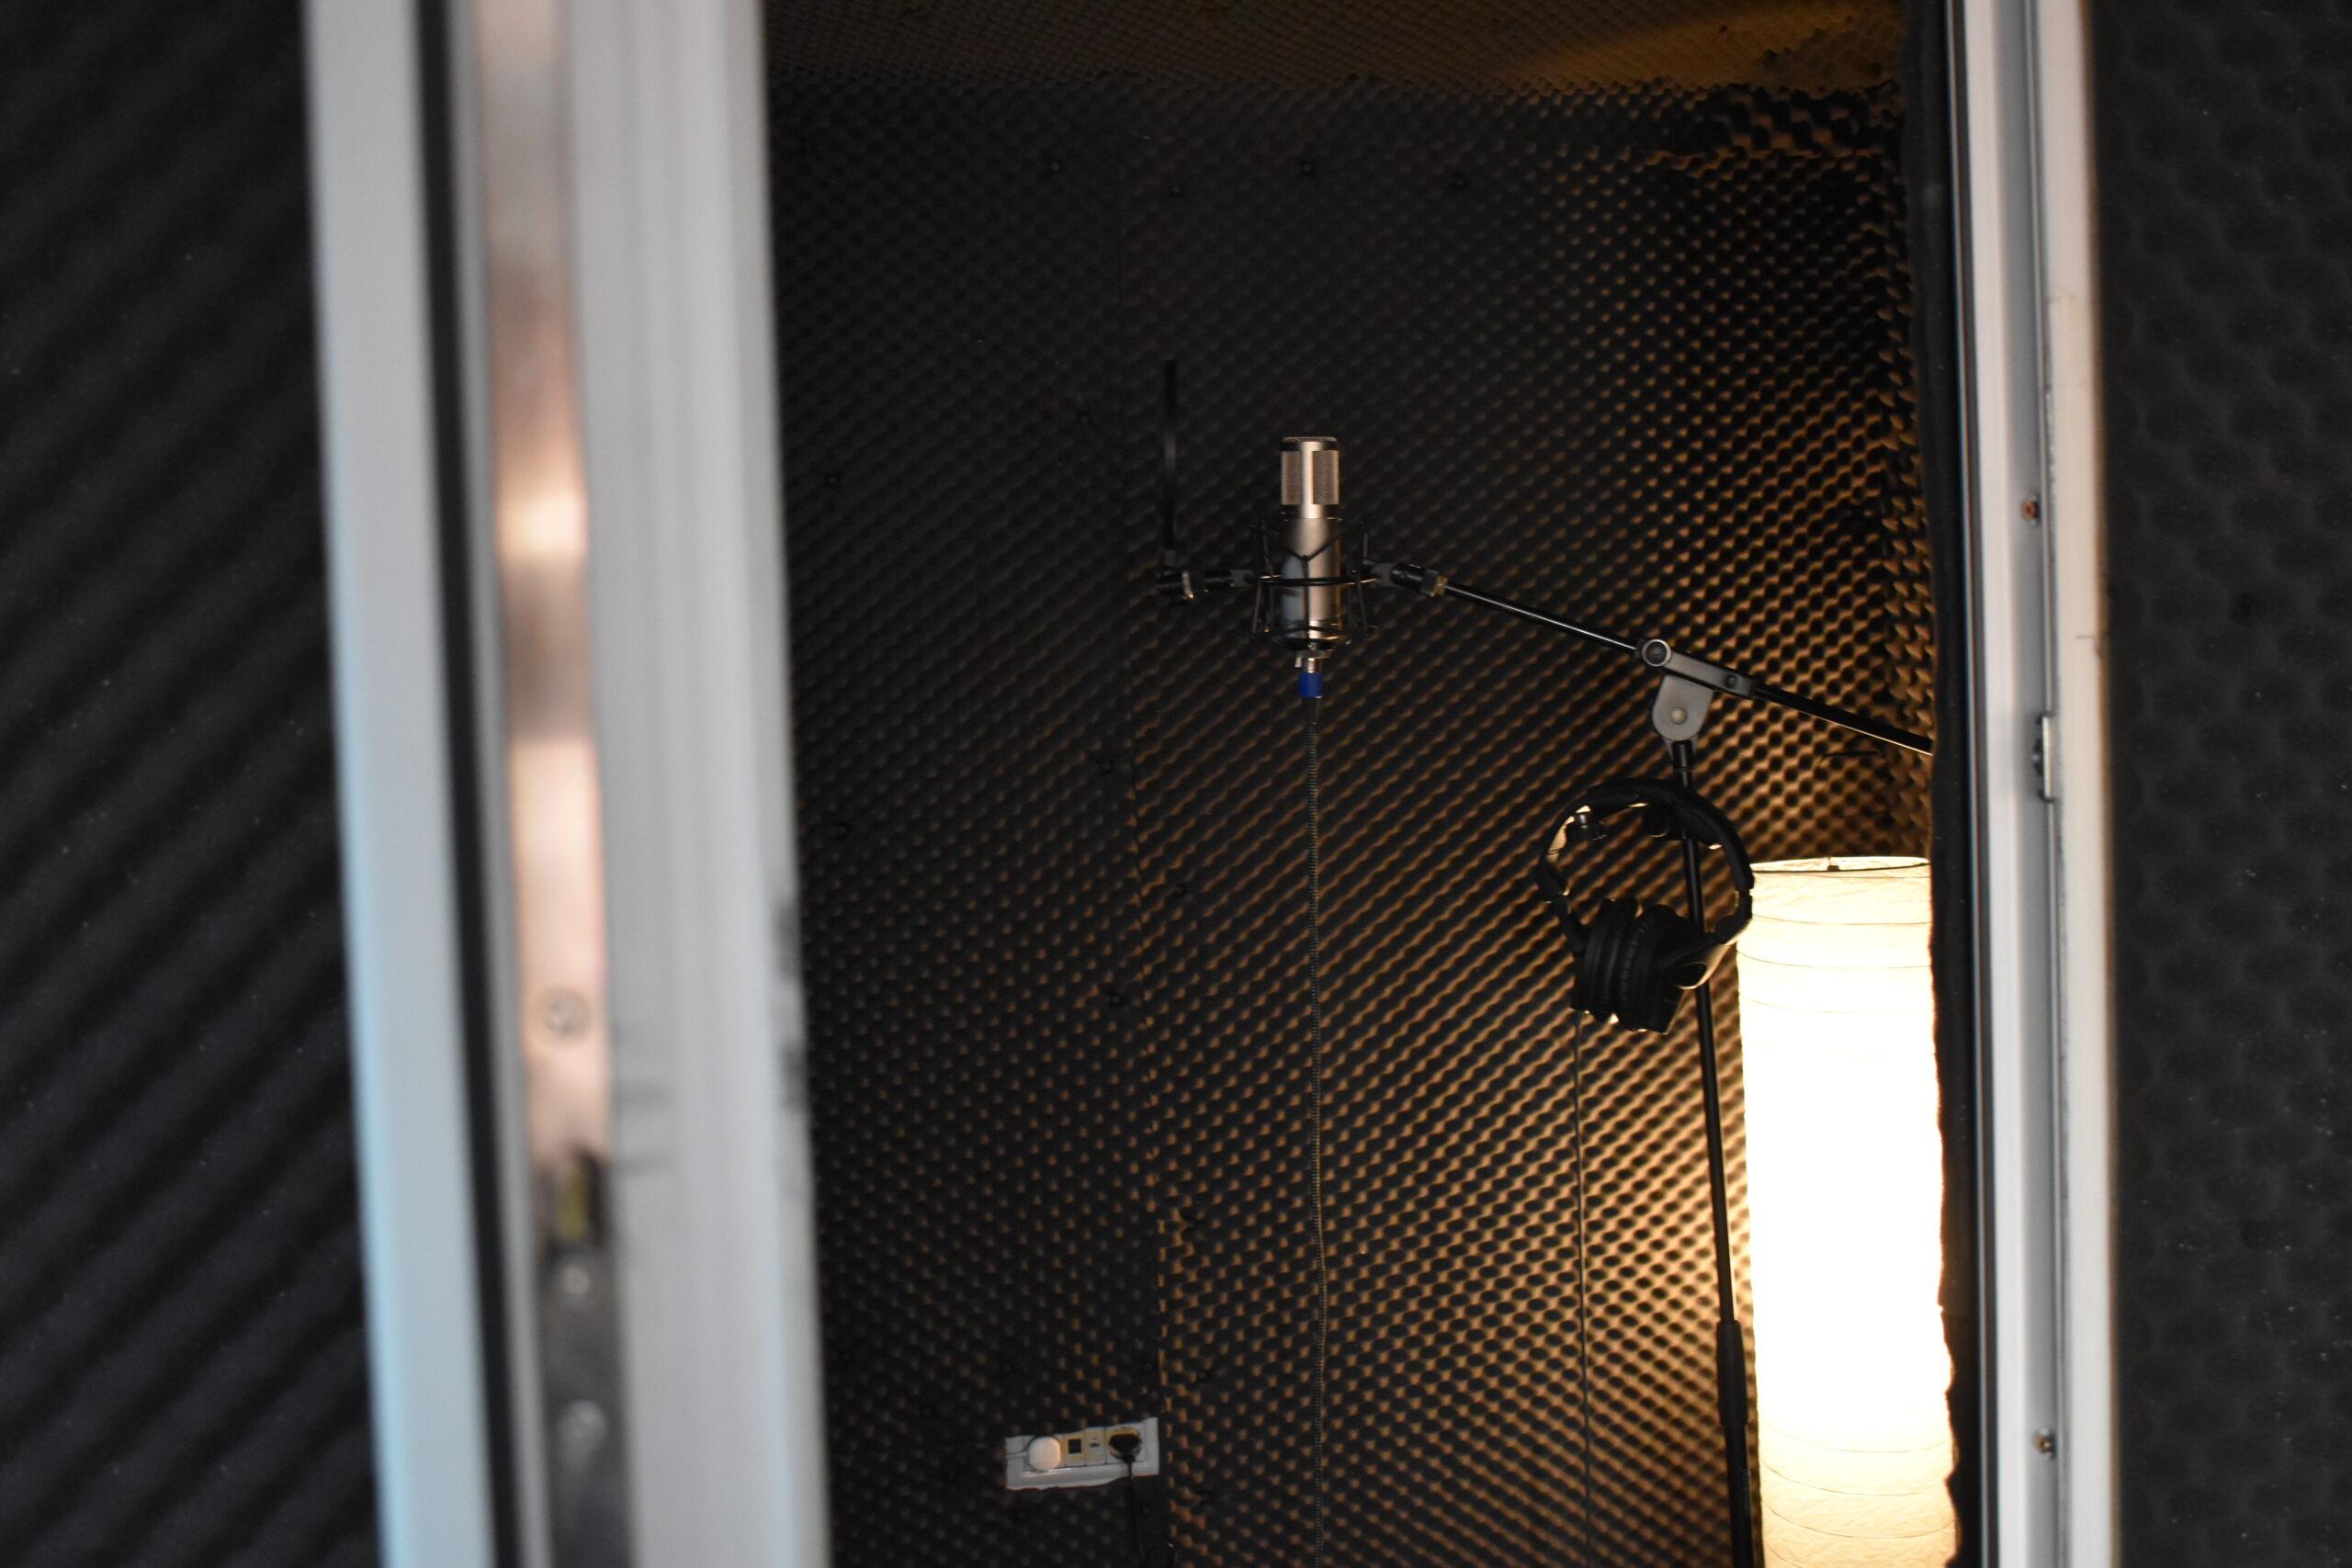 Studio de inregistrari